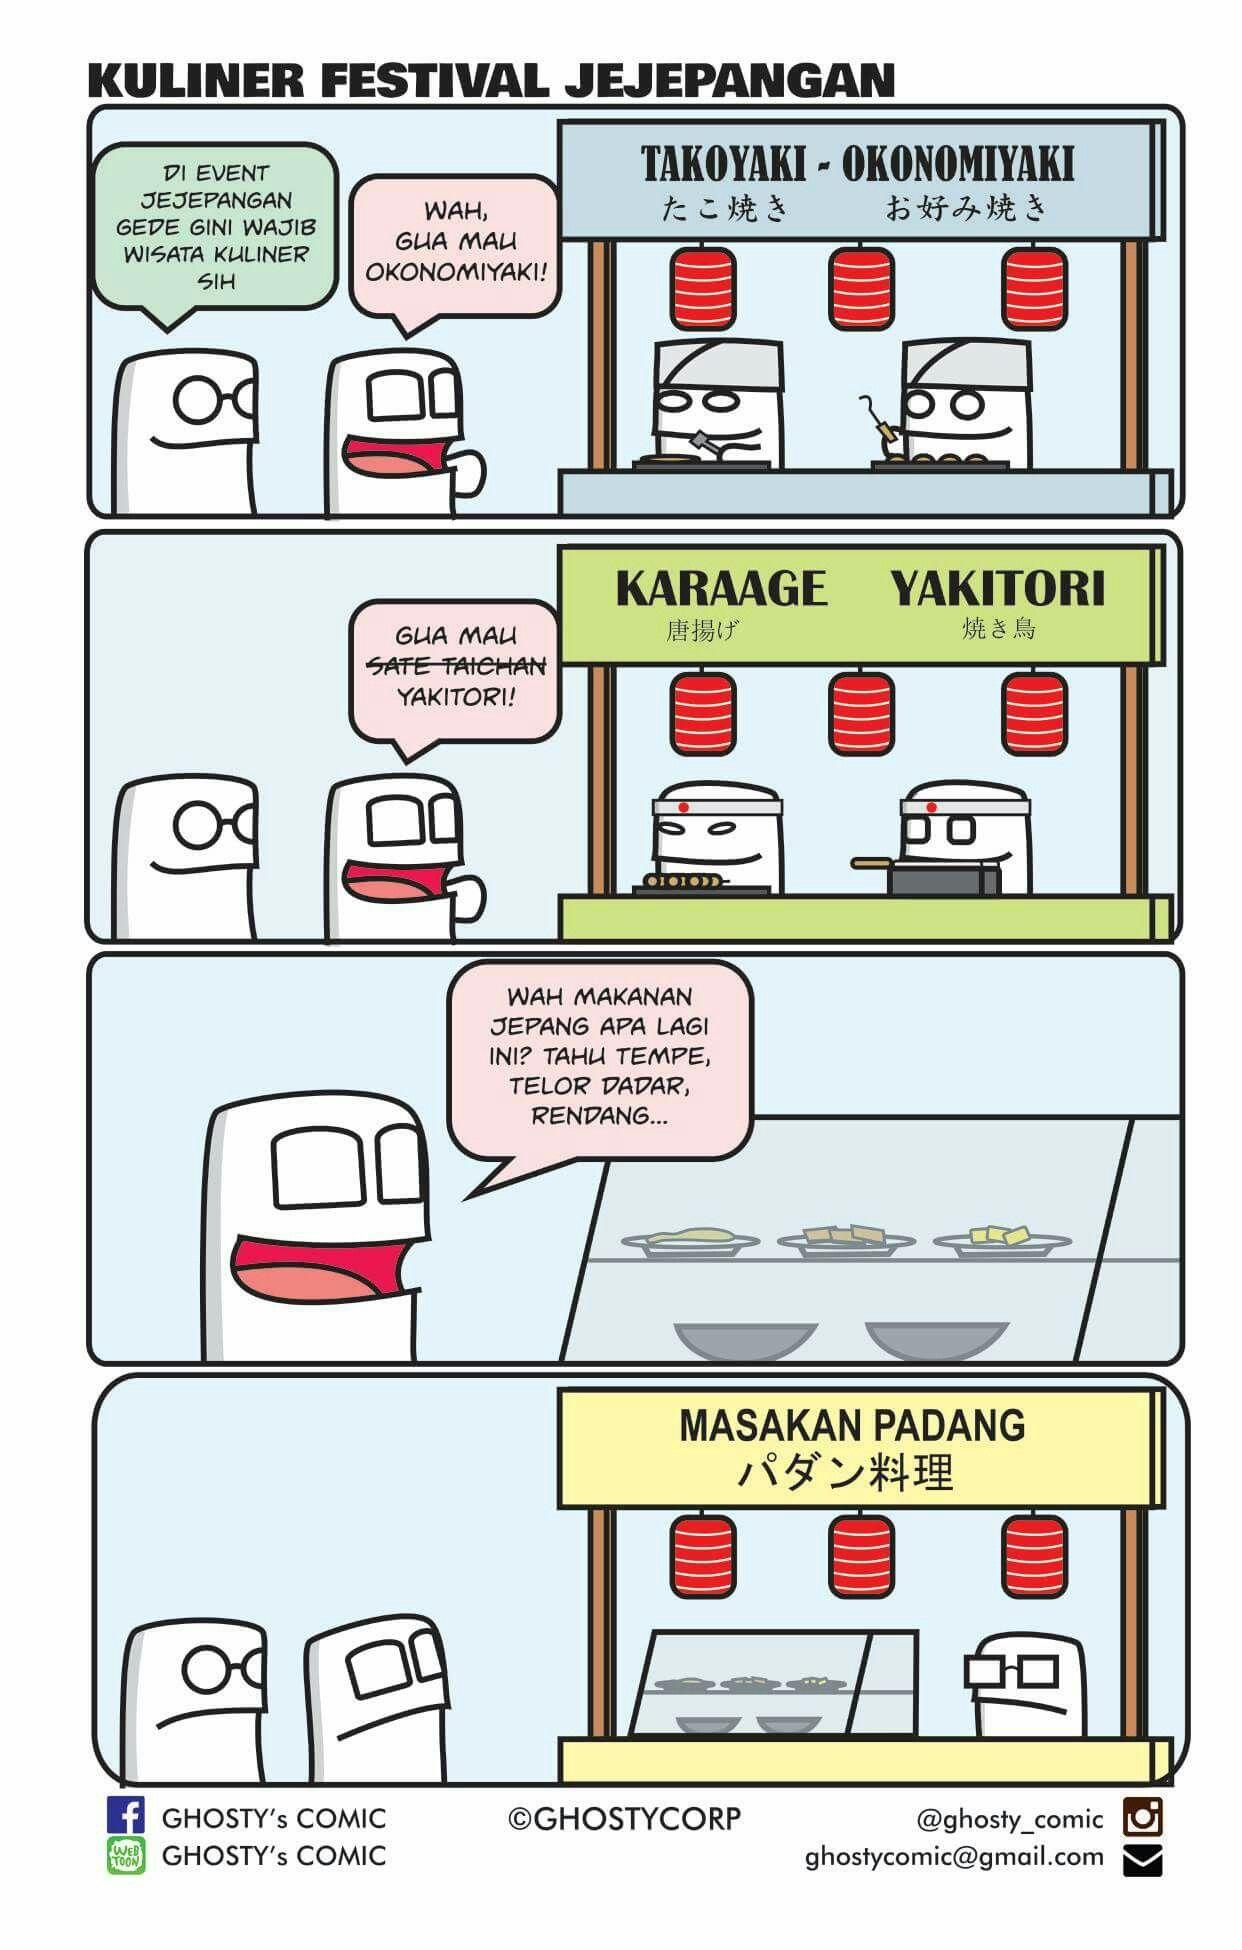 Ghosty comic (Dengan gambar) Tahu, Makanan jepang, Masakan